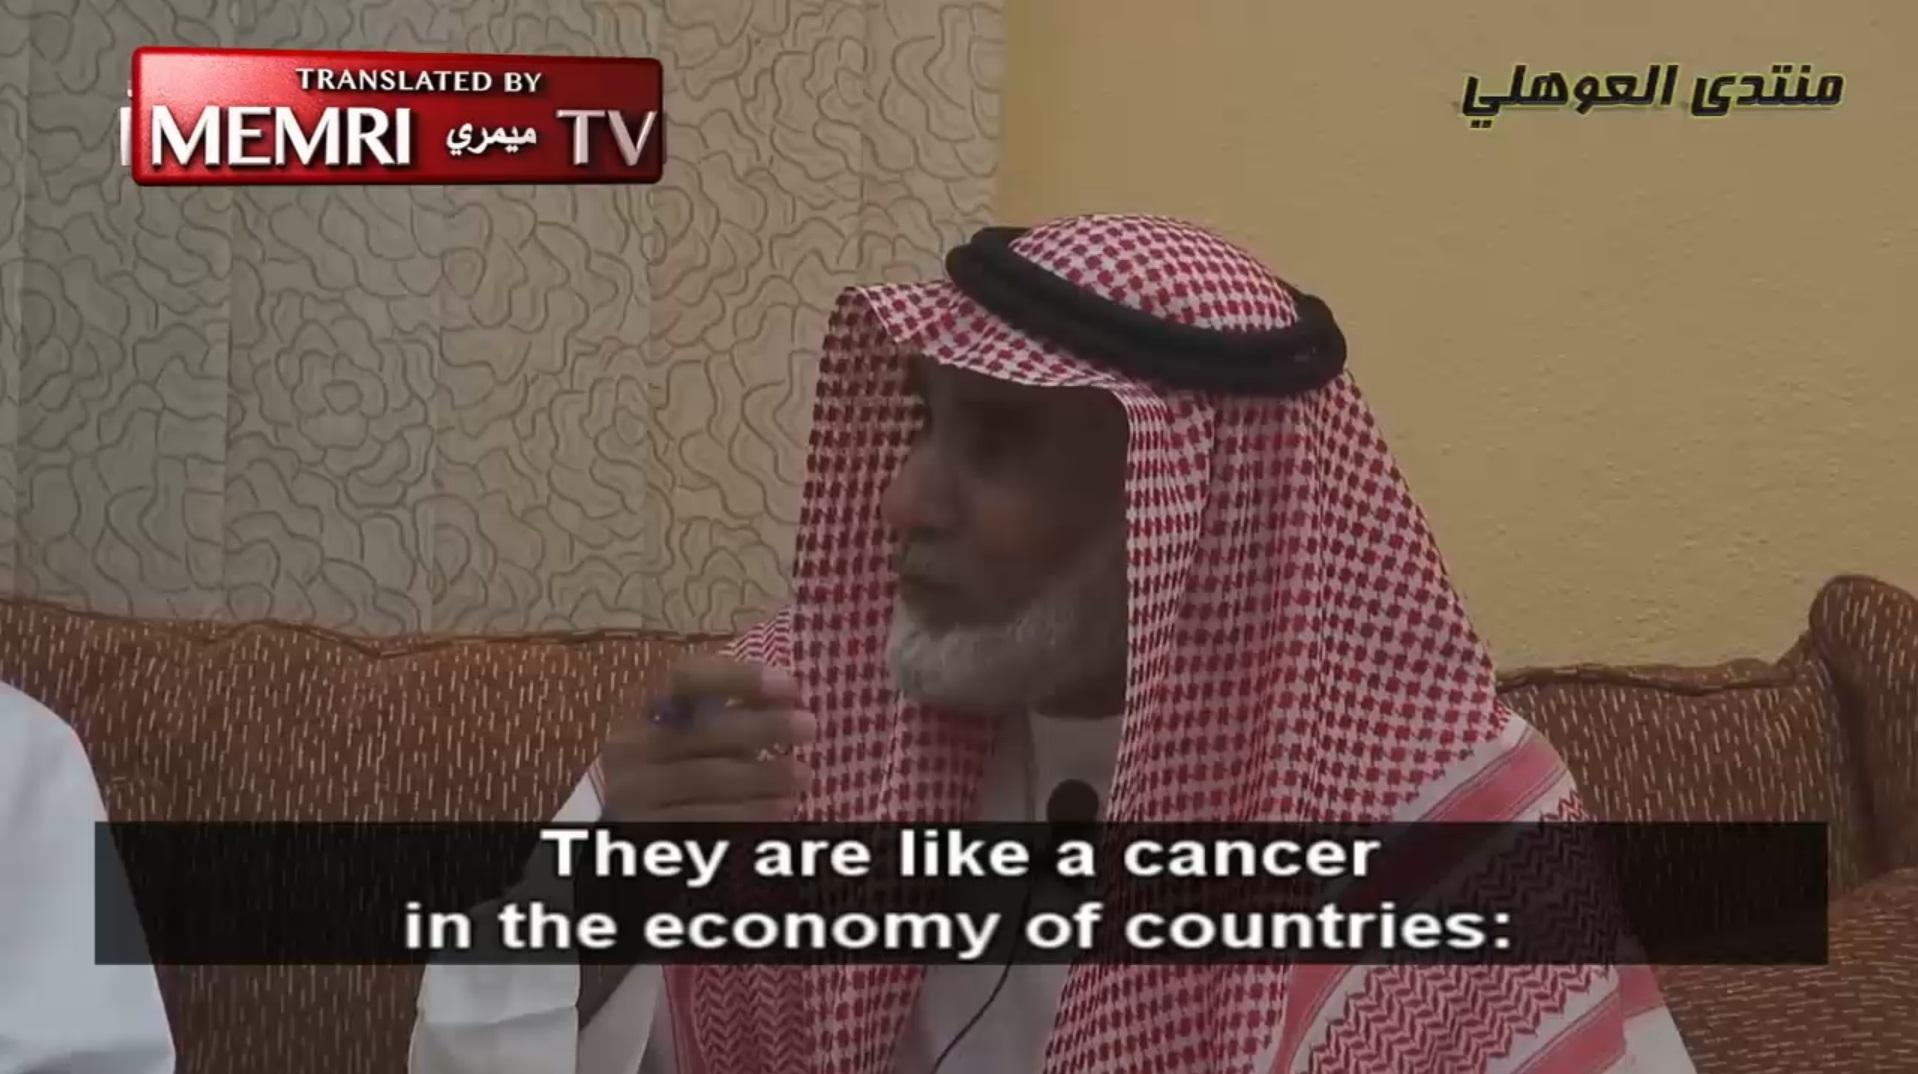 saudi-scholar-abdallah-al-yahya-the-jews-are-like-a-cancer